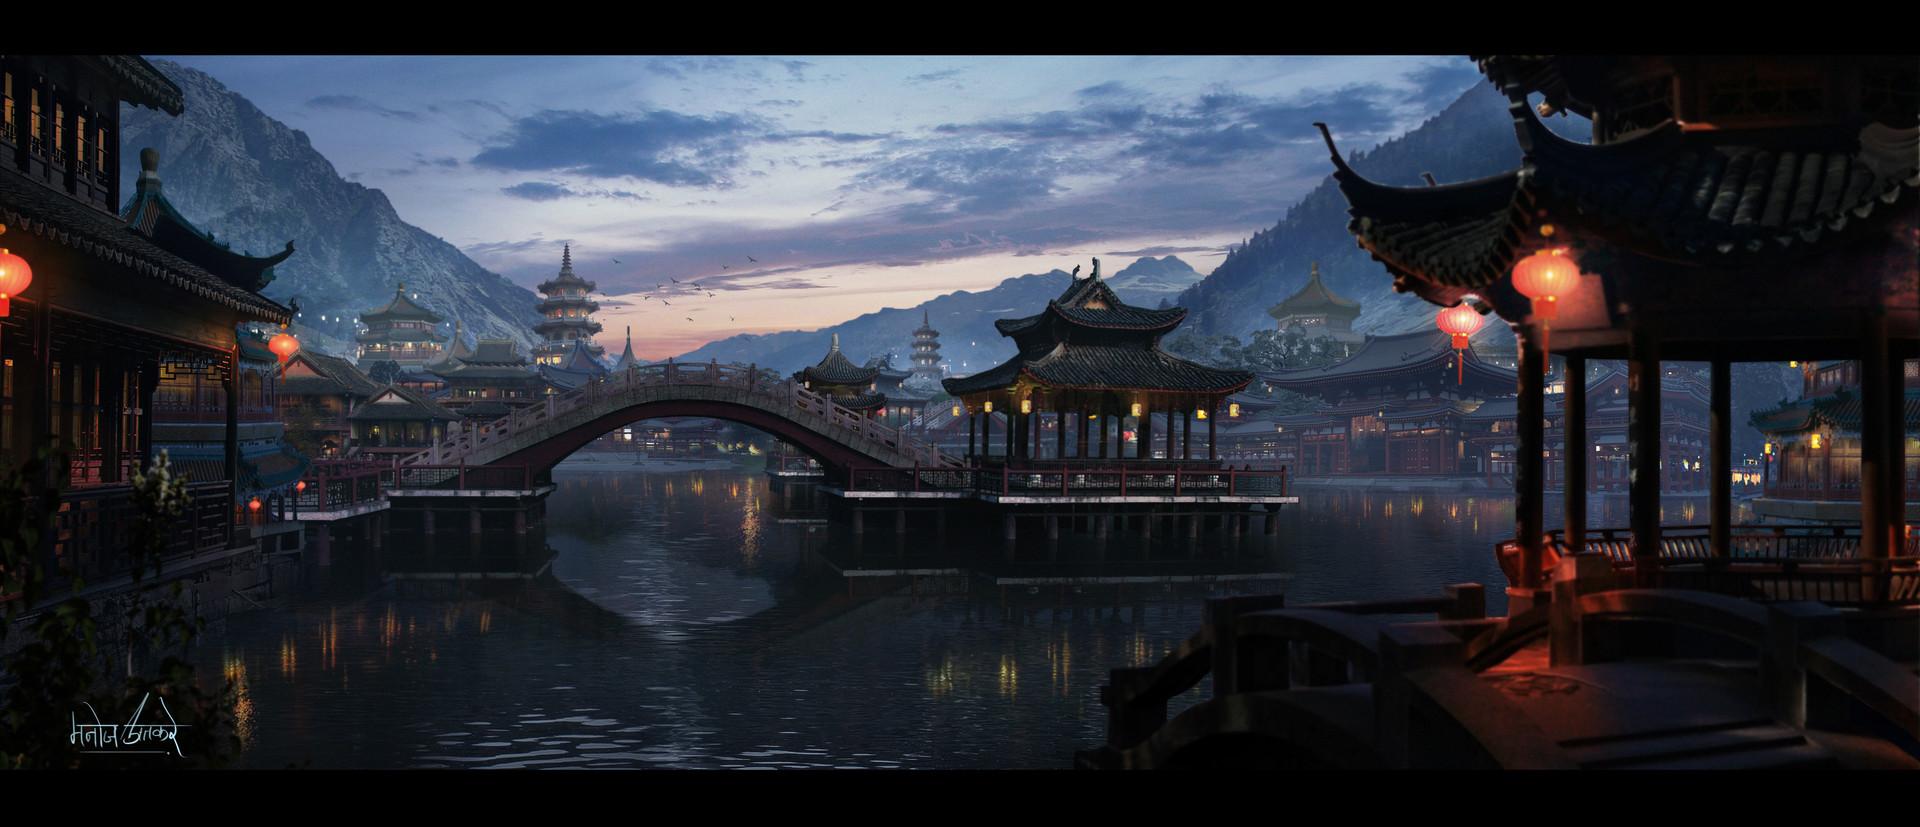 General 1920x827 artwork digital art city Asia Asian architecture water river bridge mountains lantern Chinese lantern